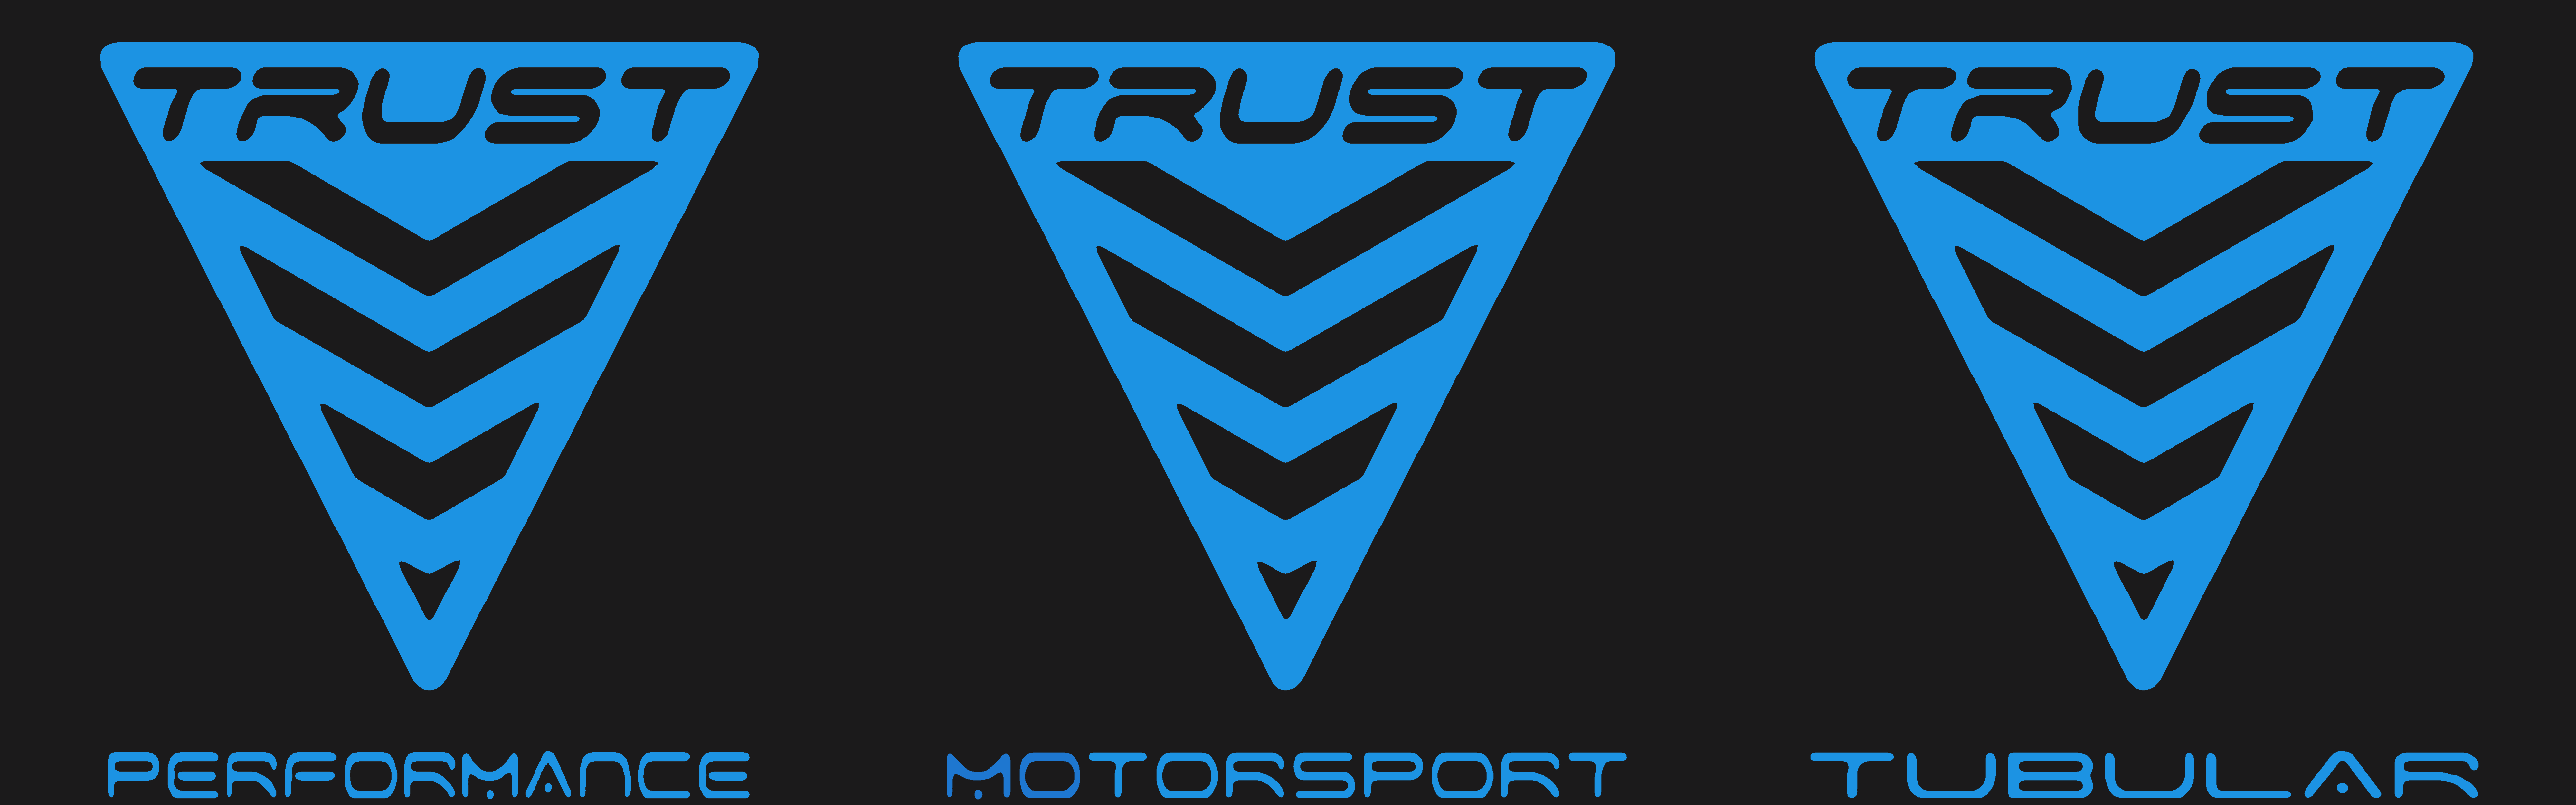 SAS Auto Customs - TRUST